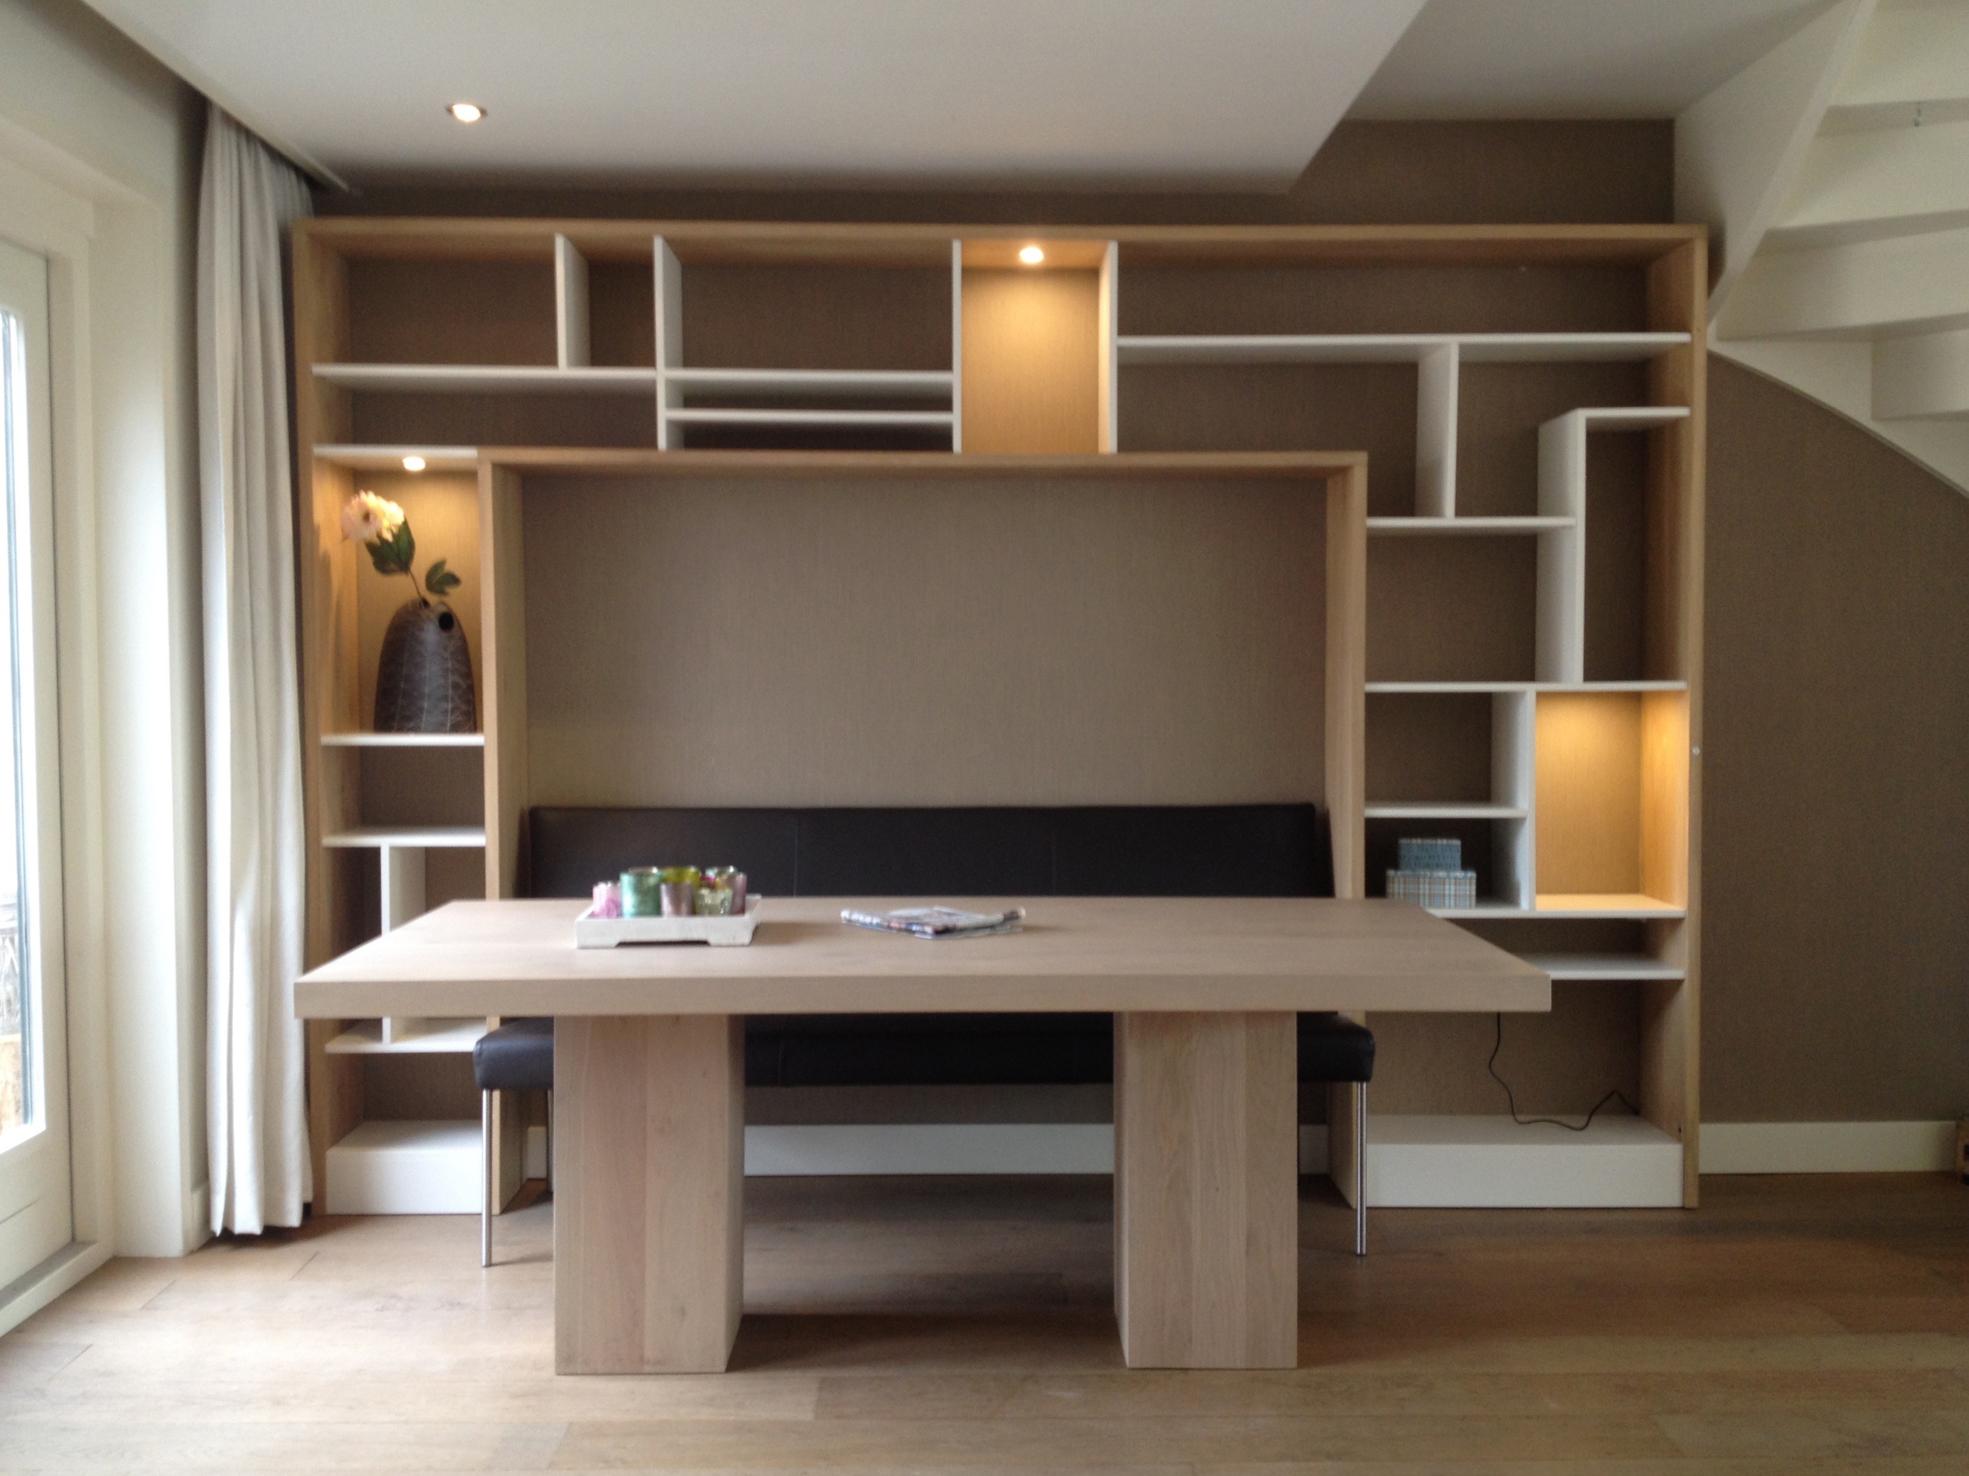 Joris b kkerink binnenwerk12 5 jaar thuis in interieur bathmense krant - Interieurontwerp thuis kleur ...